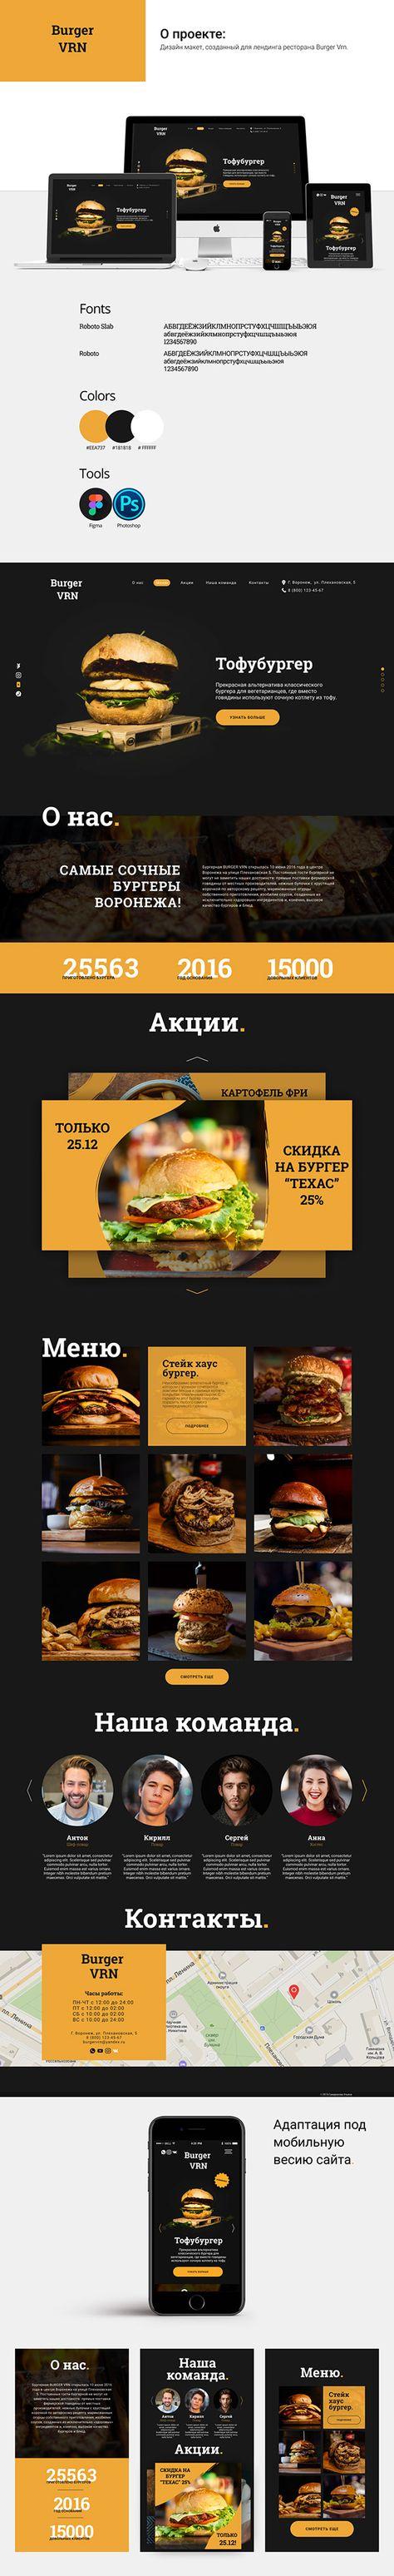 BURGER VRN - landing page для ресторана.